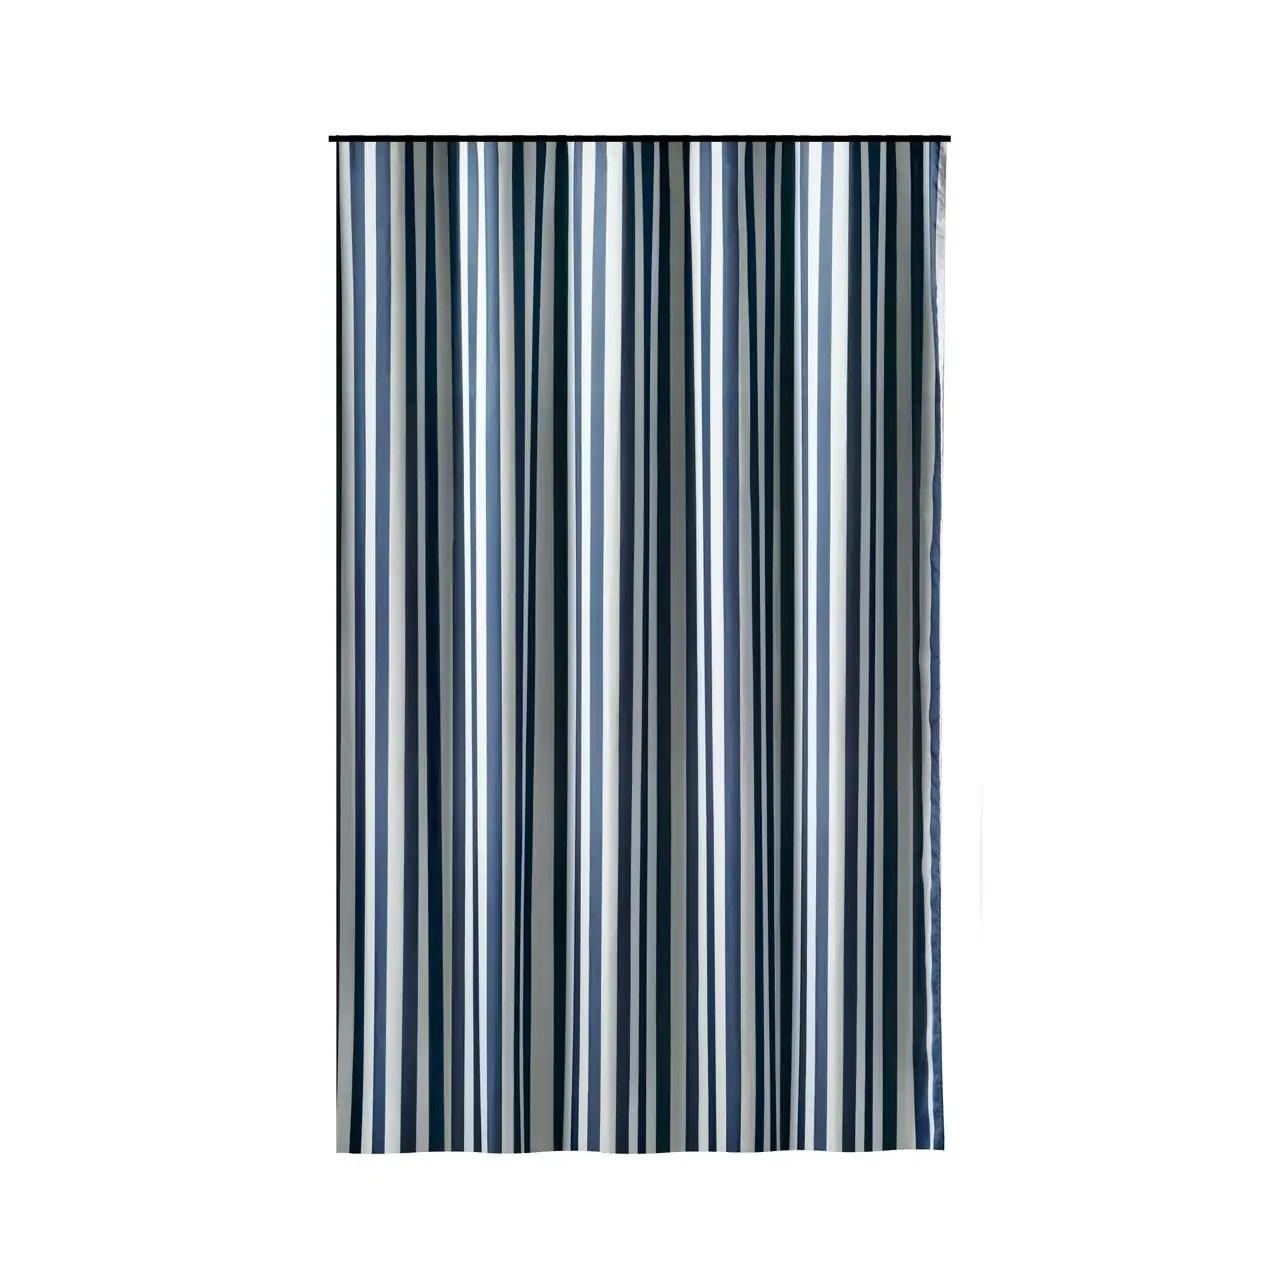 Gamma Extra Long Shower Curtain 78 X 72 Inch Deep Blue Stripes Fabric